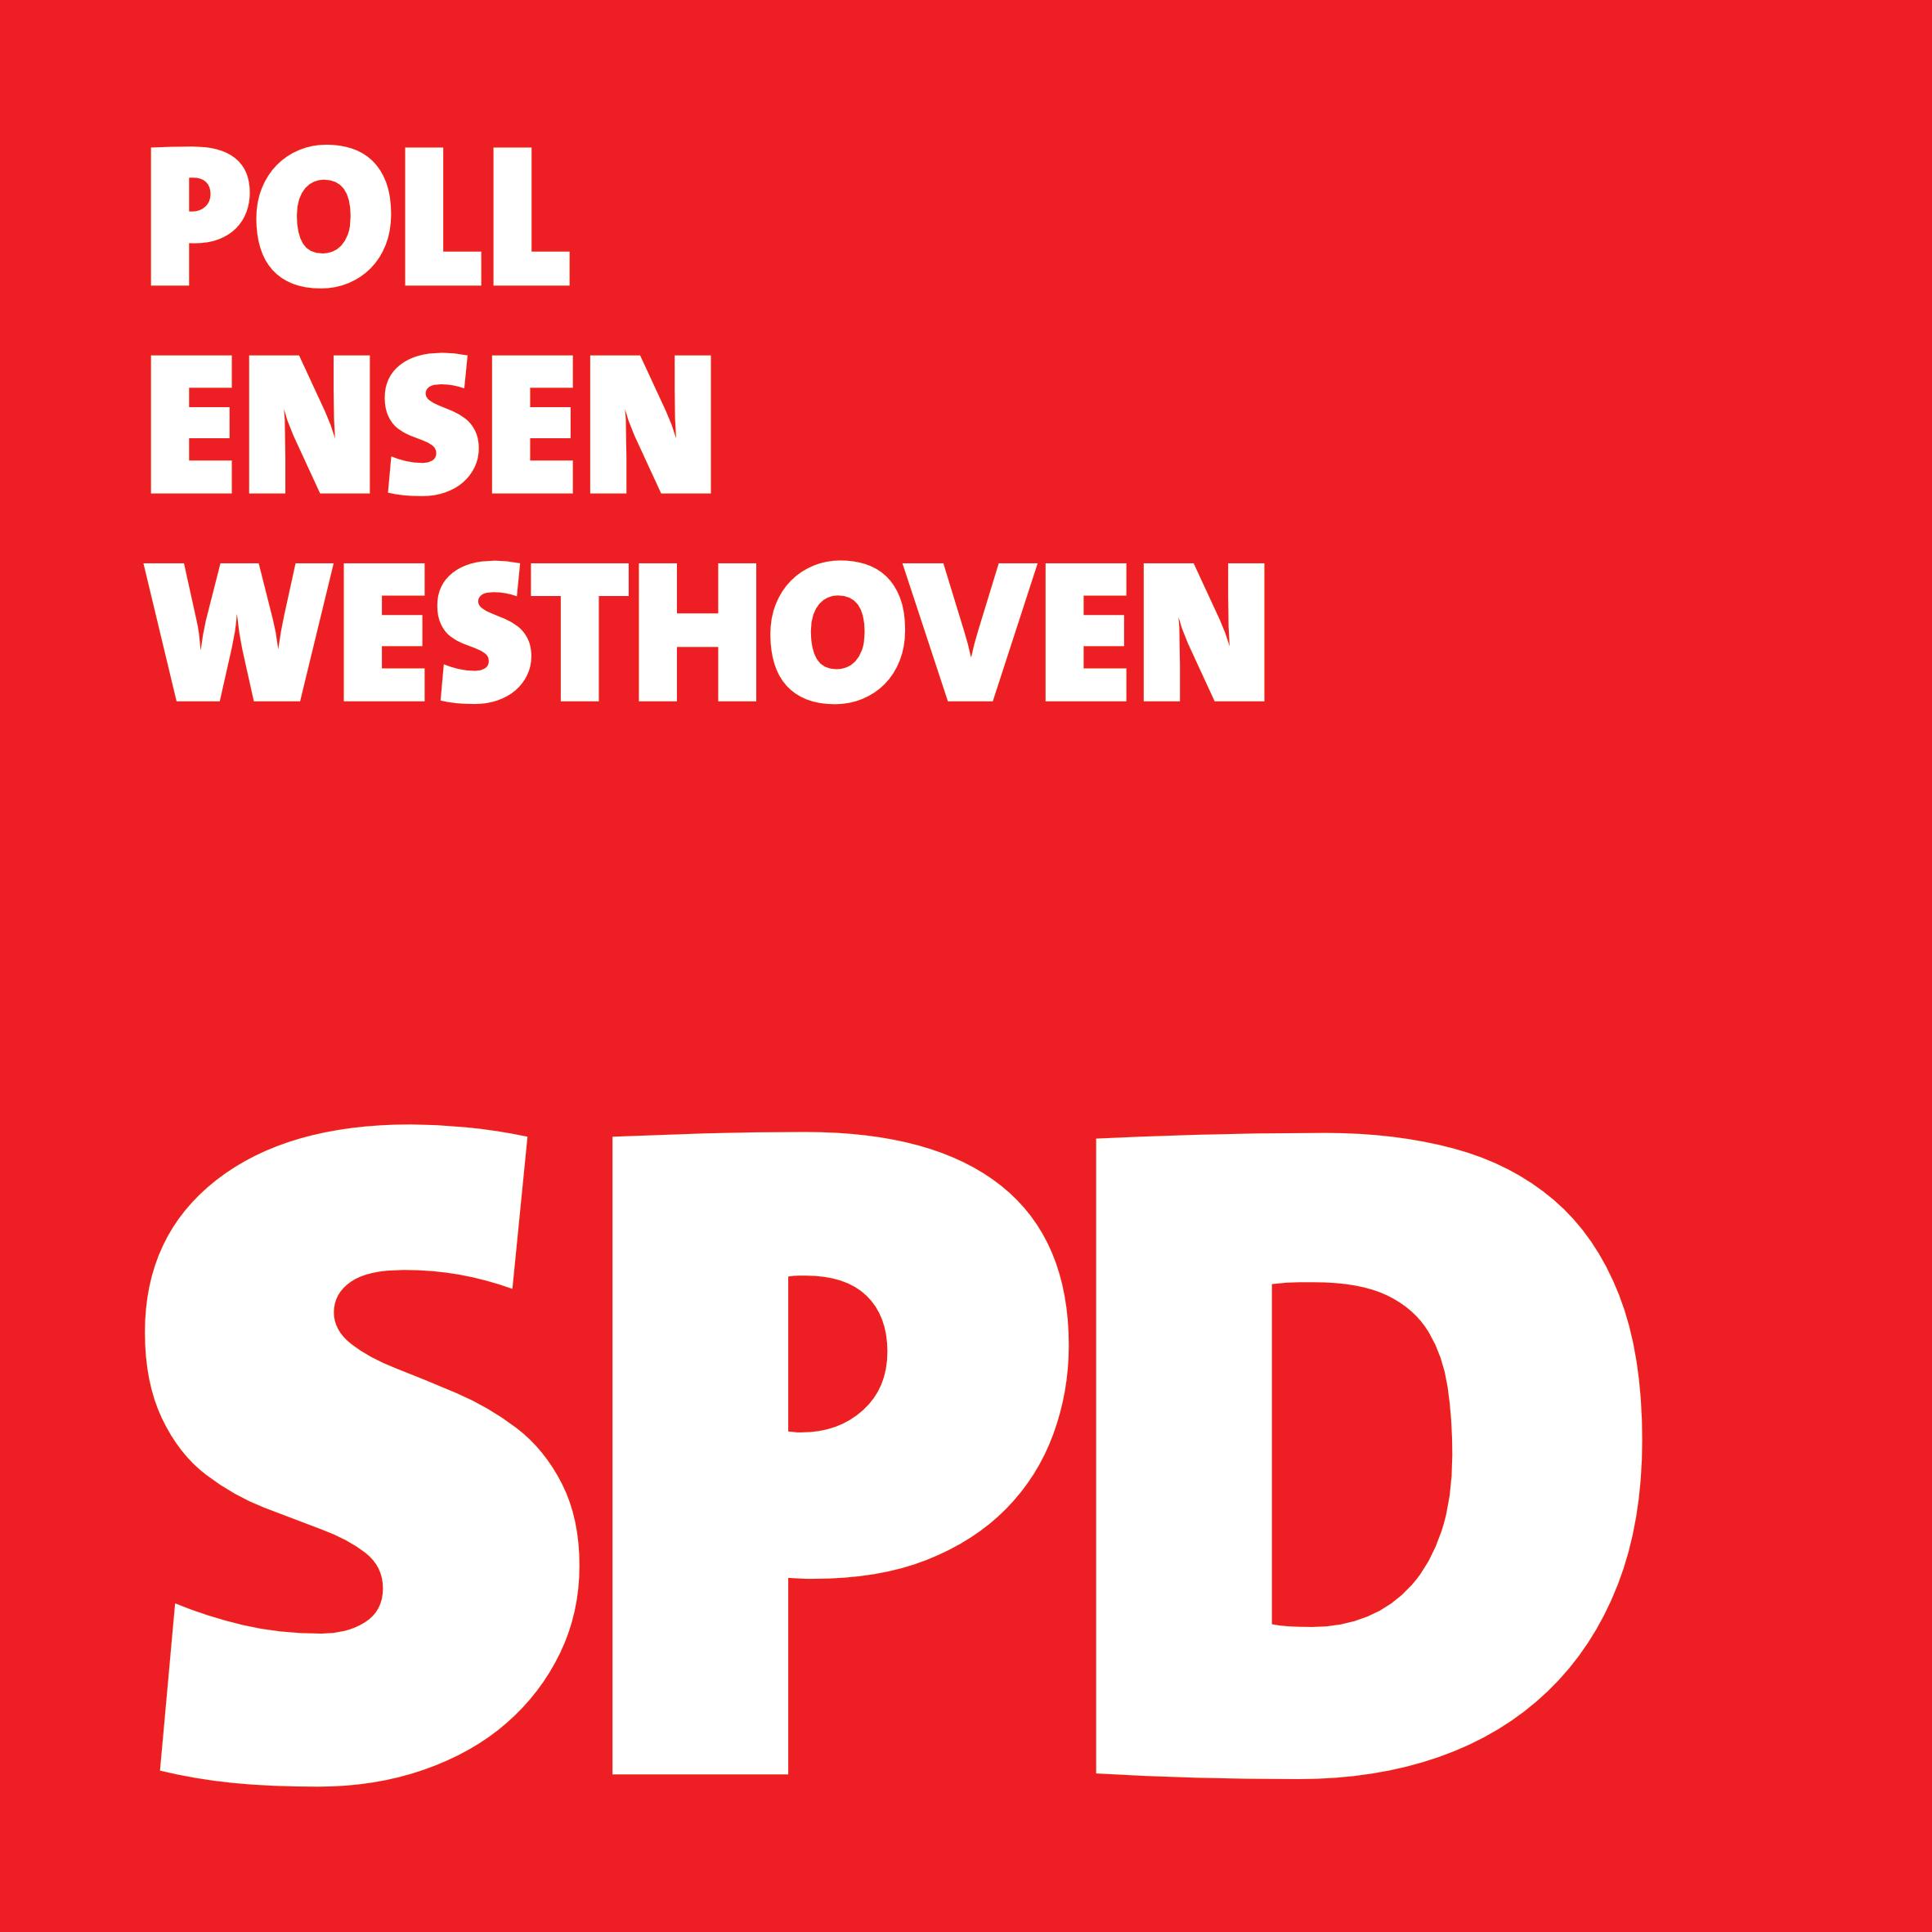 SPD PollEnsenWesthoven